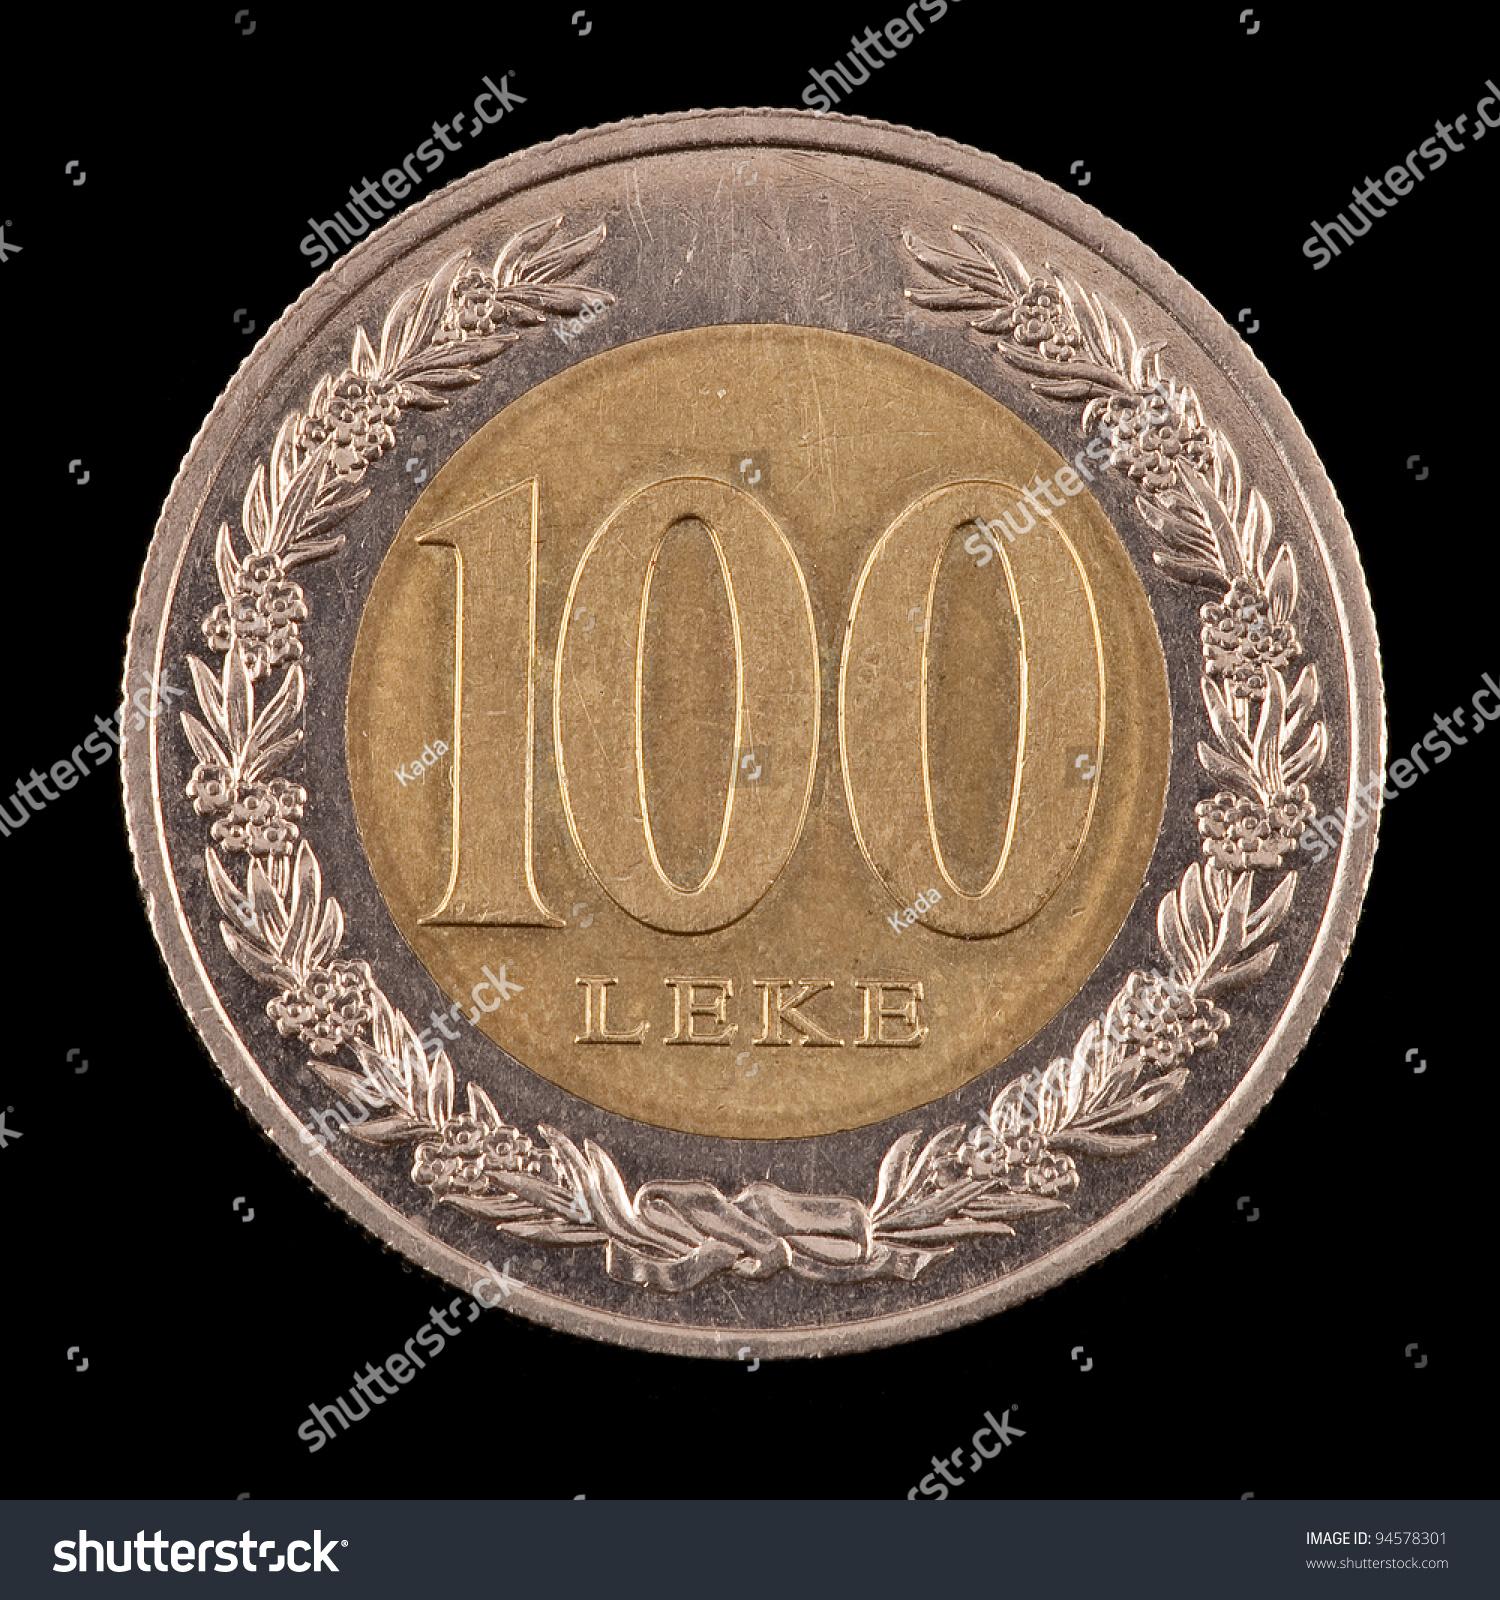 Famous Albanian Landmarks Stock Photo The Albanian Coin On The Black